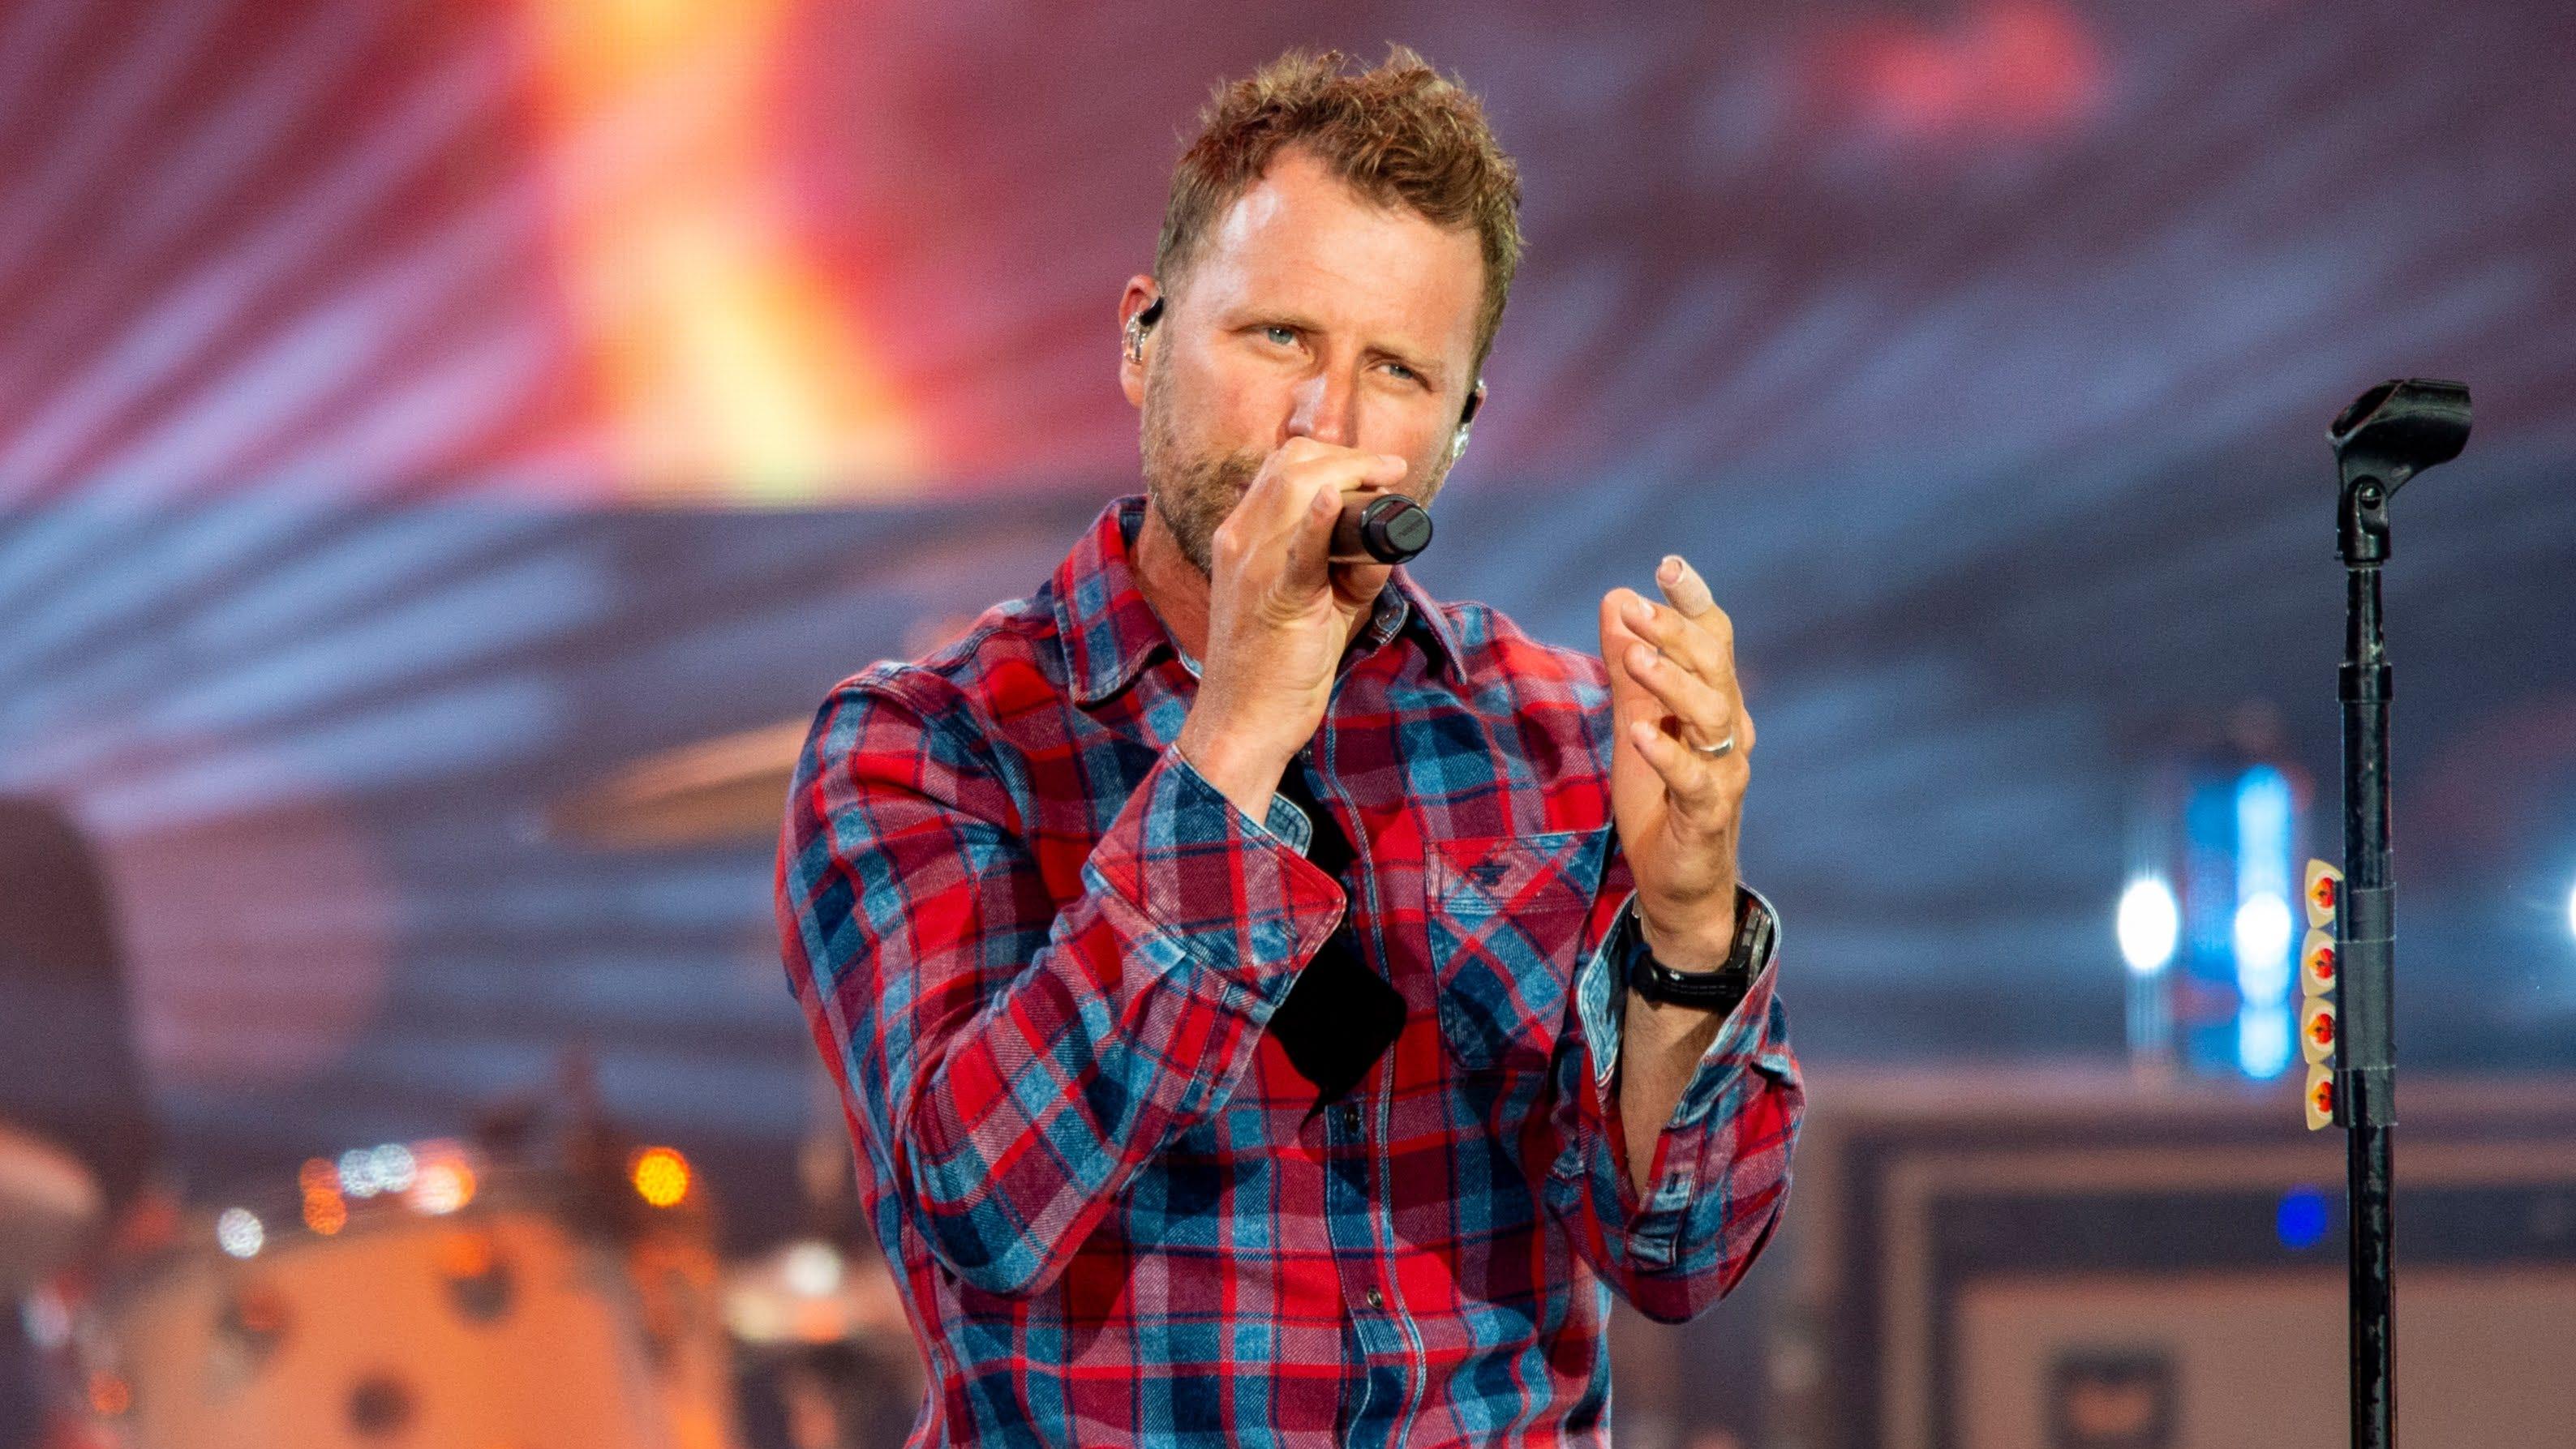 Burning Man Dierks Bentley Echoes U2 S Unforgettable Fire At Ruoff